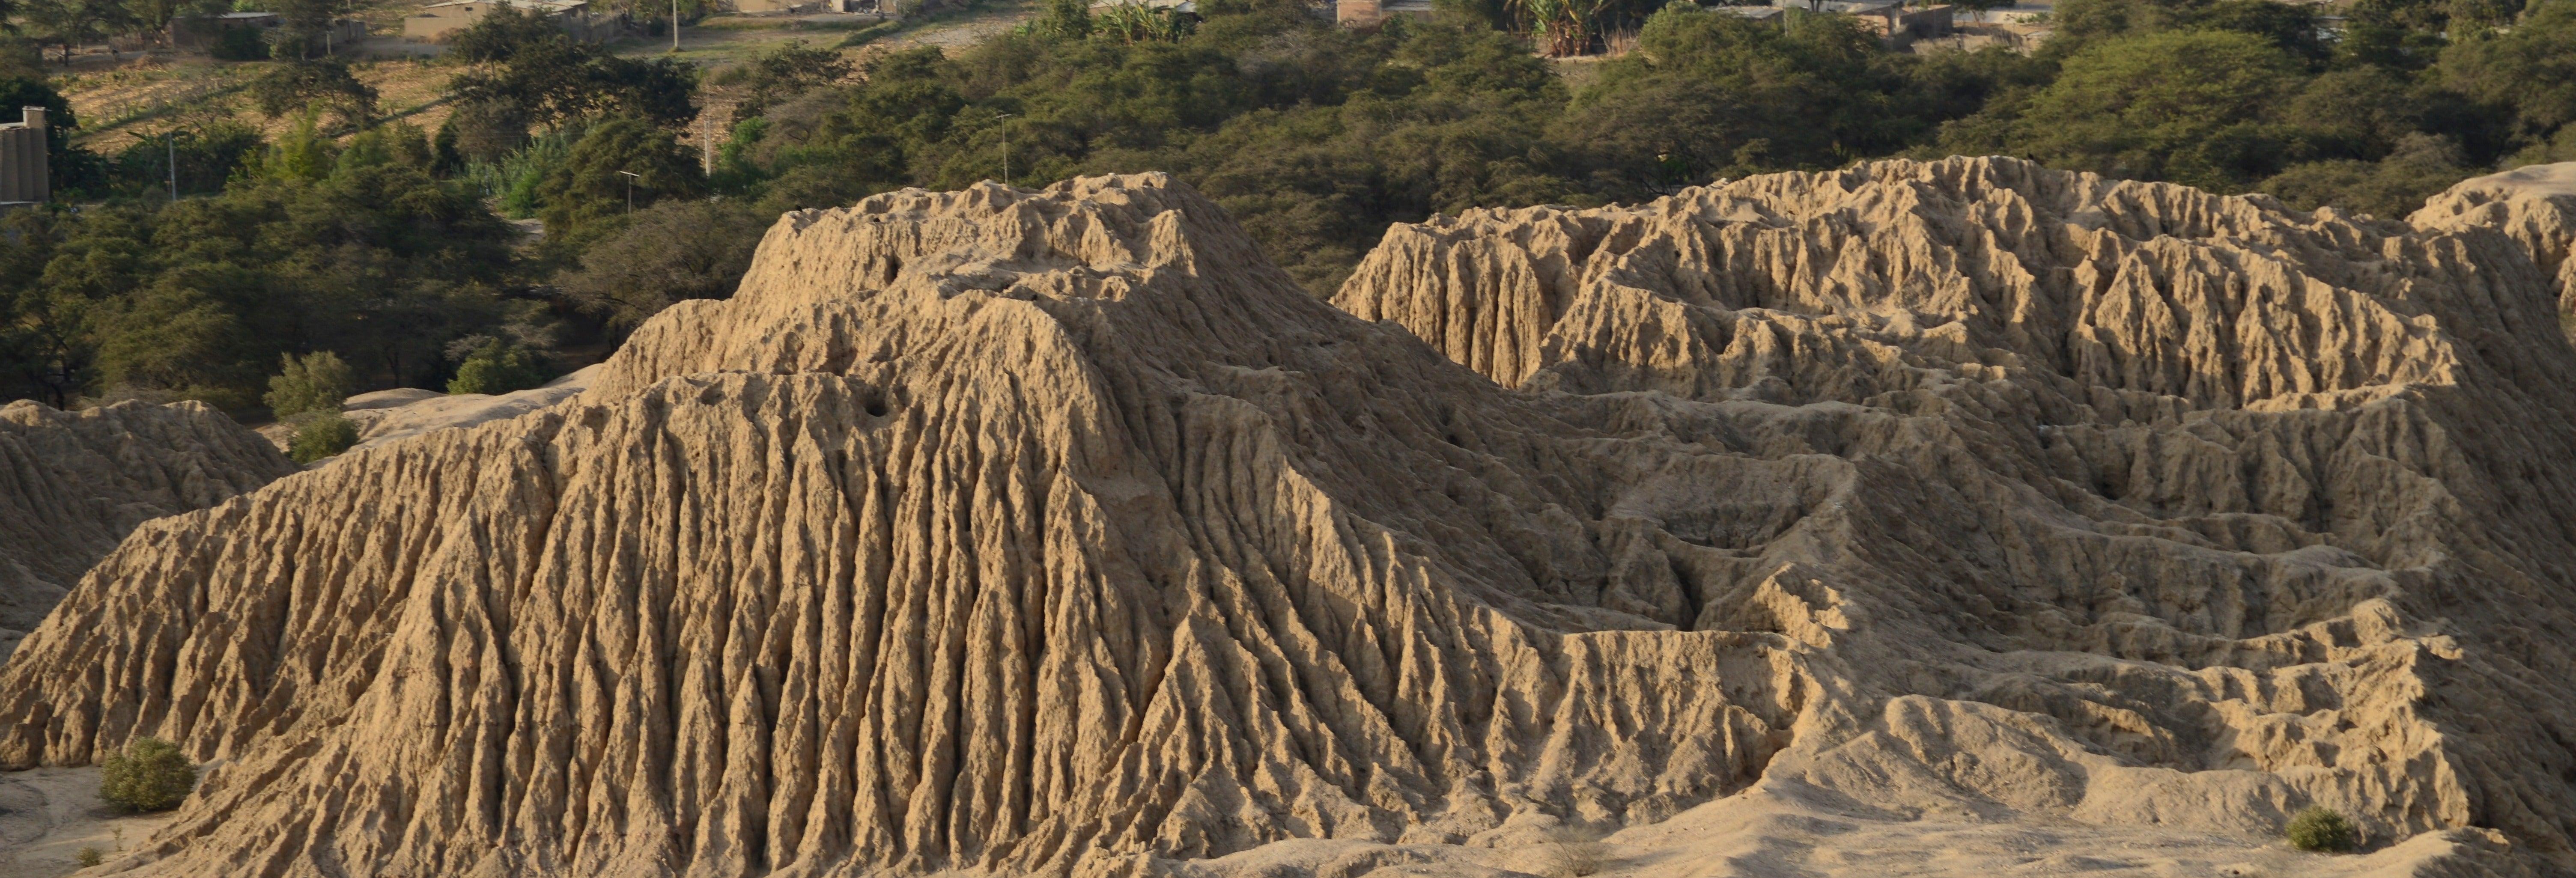 Museo Brüning + Huaca Chotuna